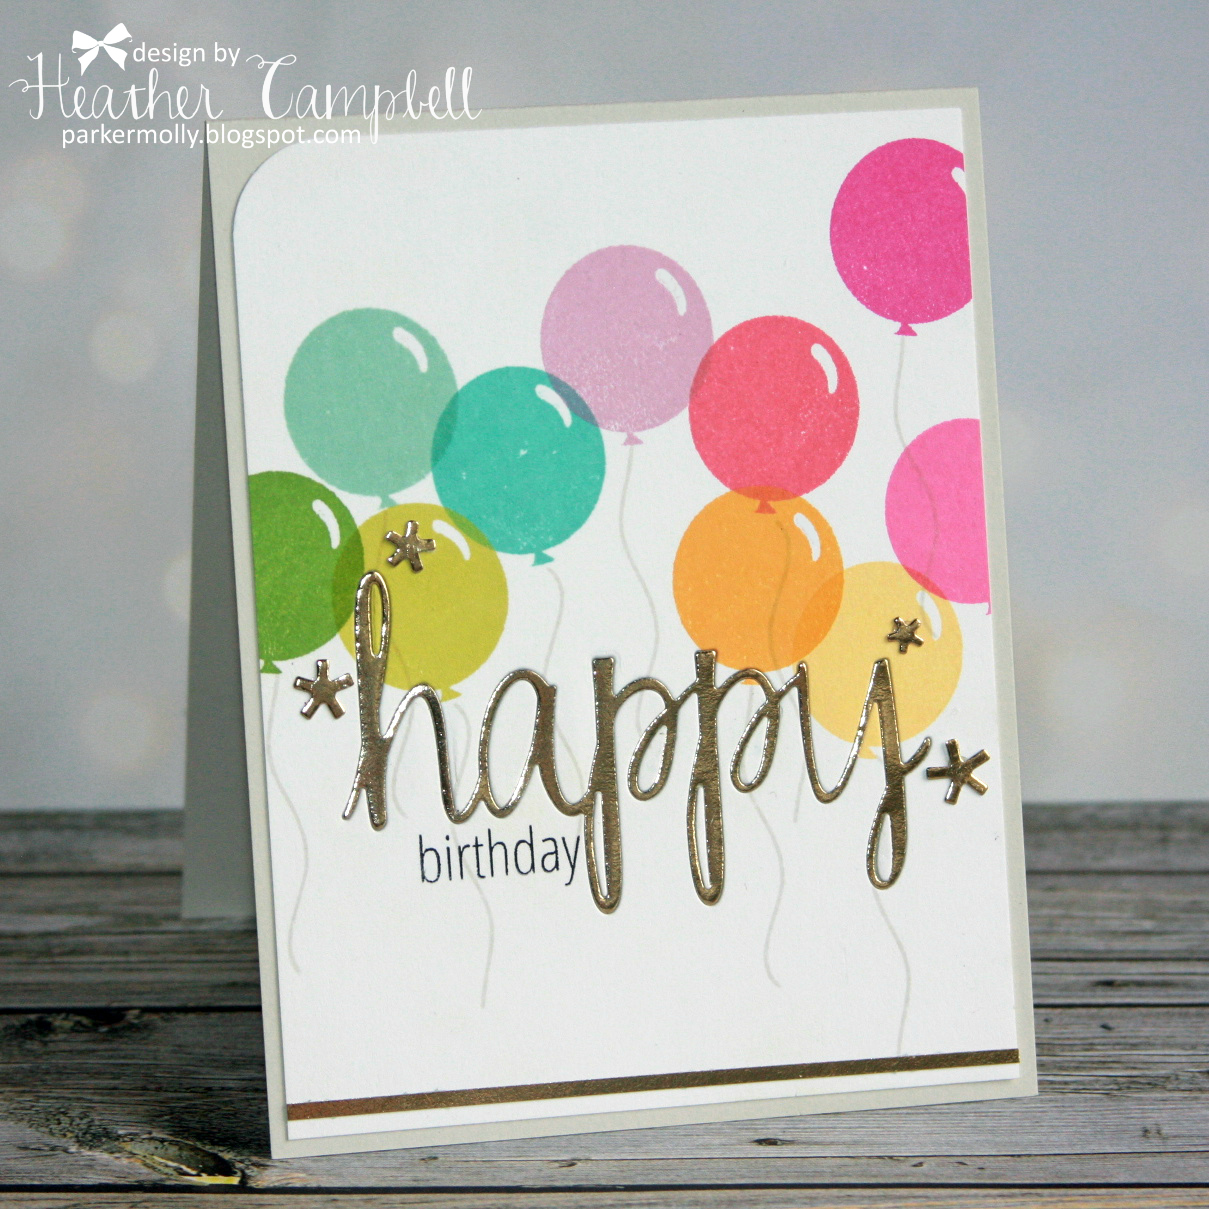 Avery birthday cards kubreforic avery birthday cards m4hsunfo